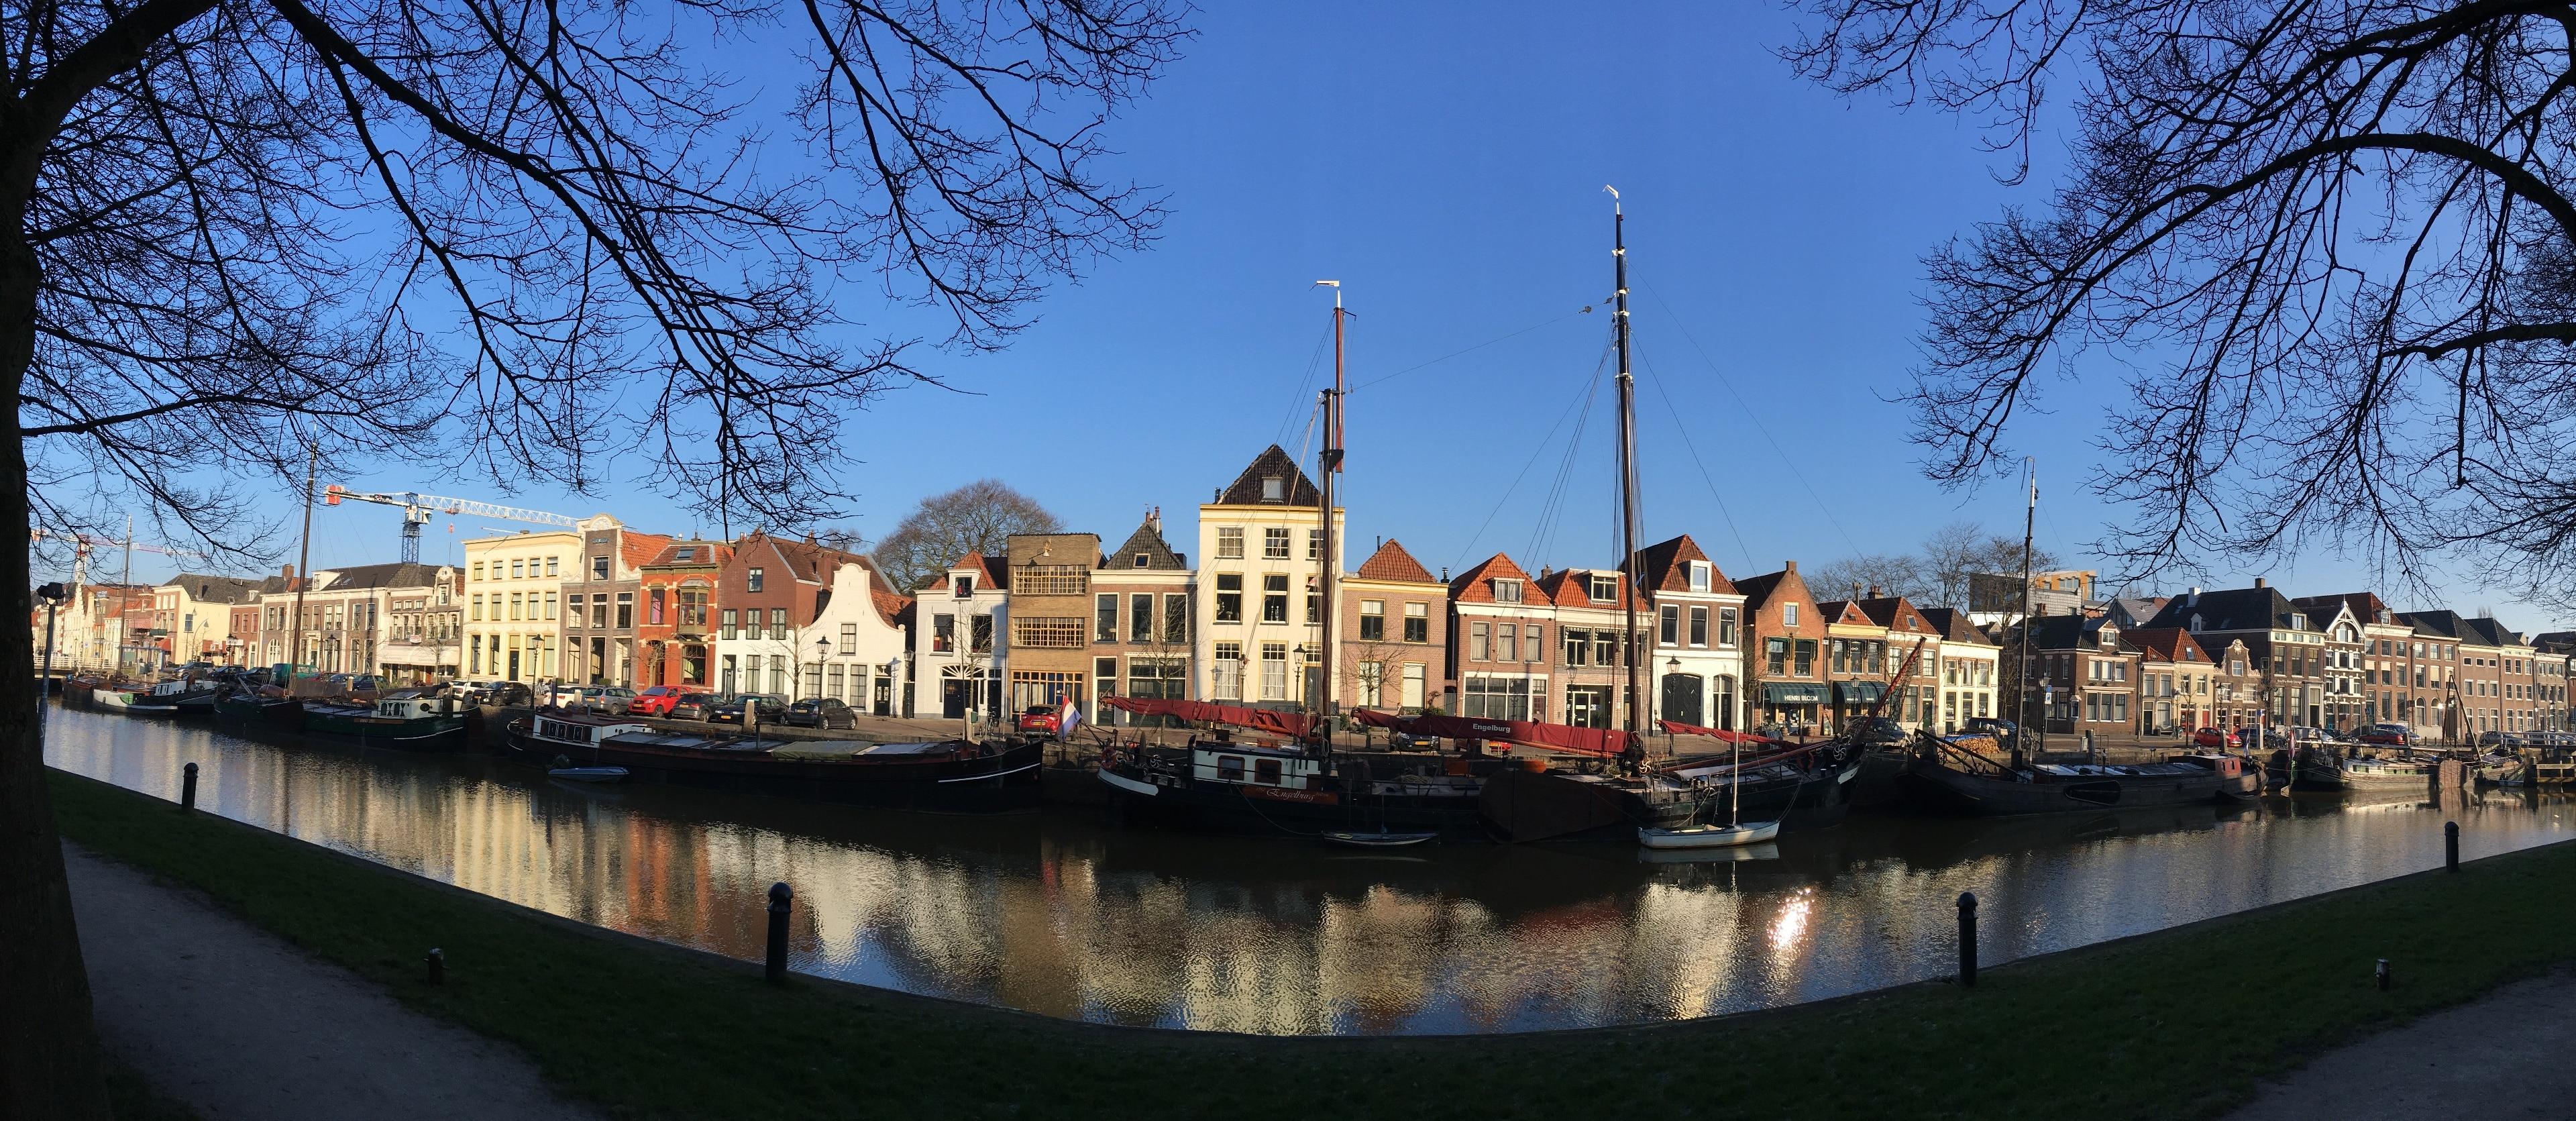 Zwolle, Overijssel, Países Bajos